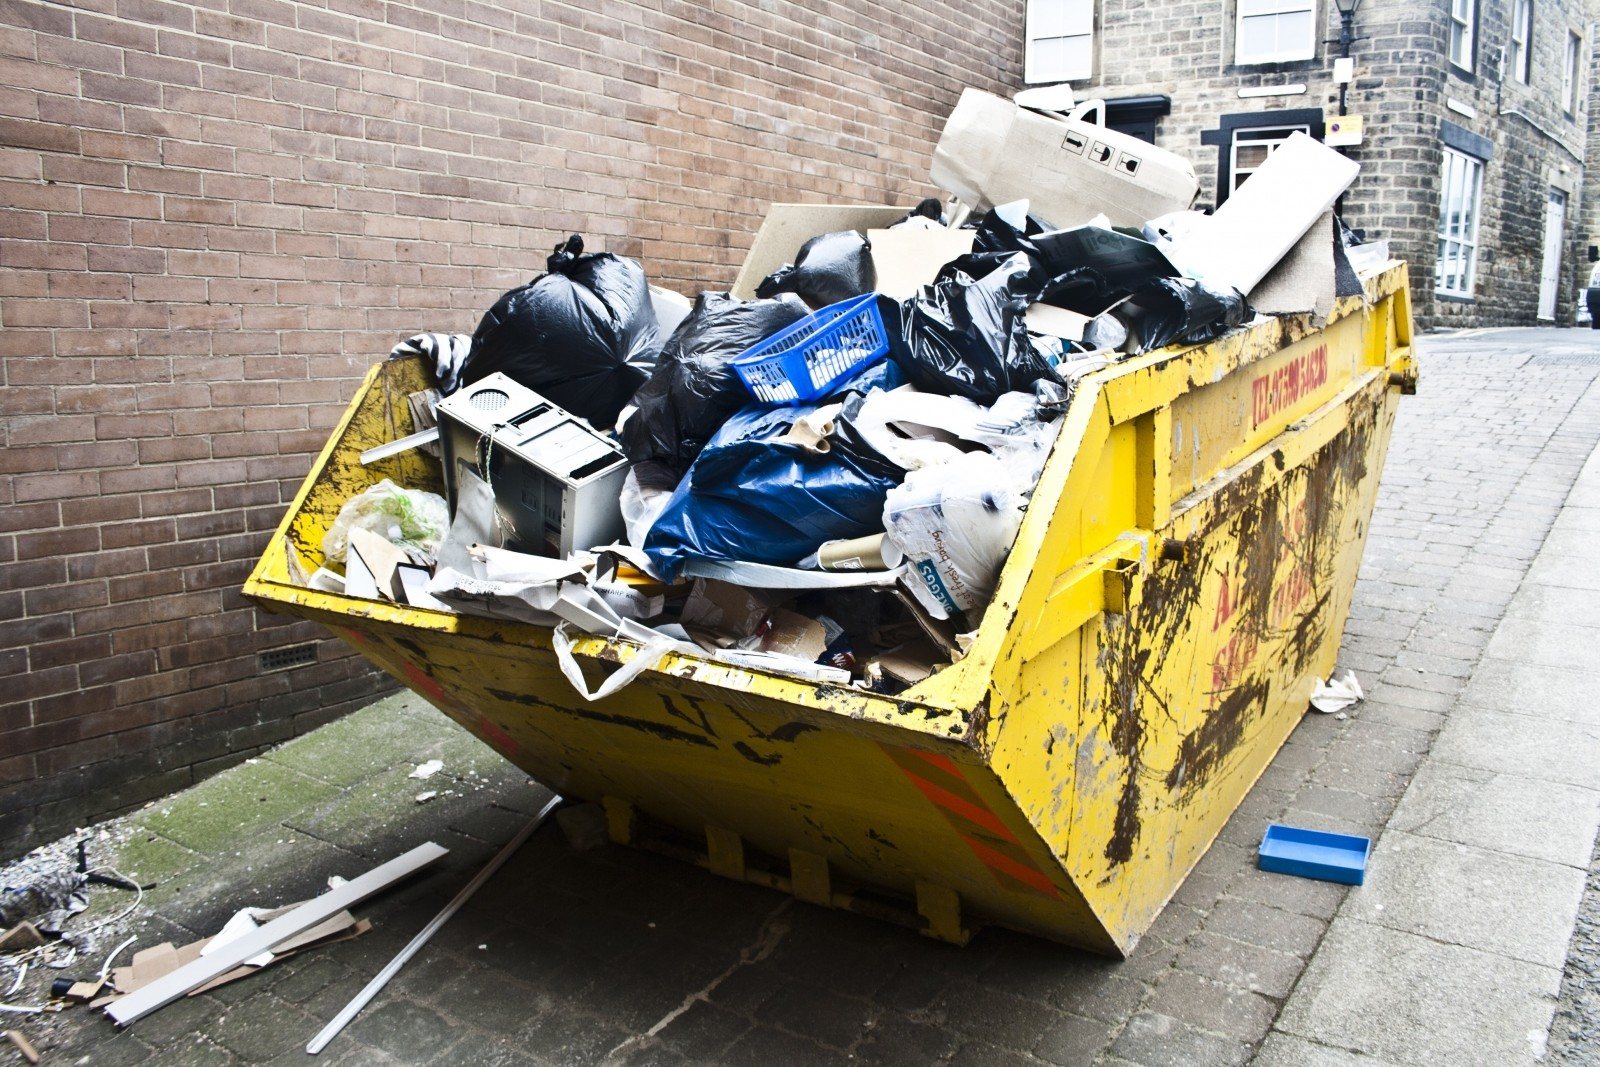 rubbish-litter-trash-garbage-waste-dump-recycle